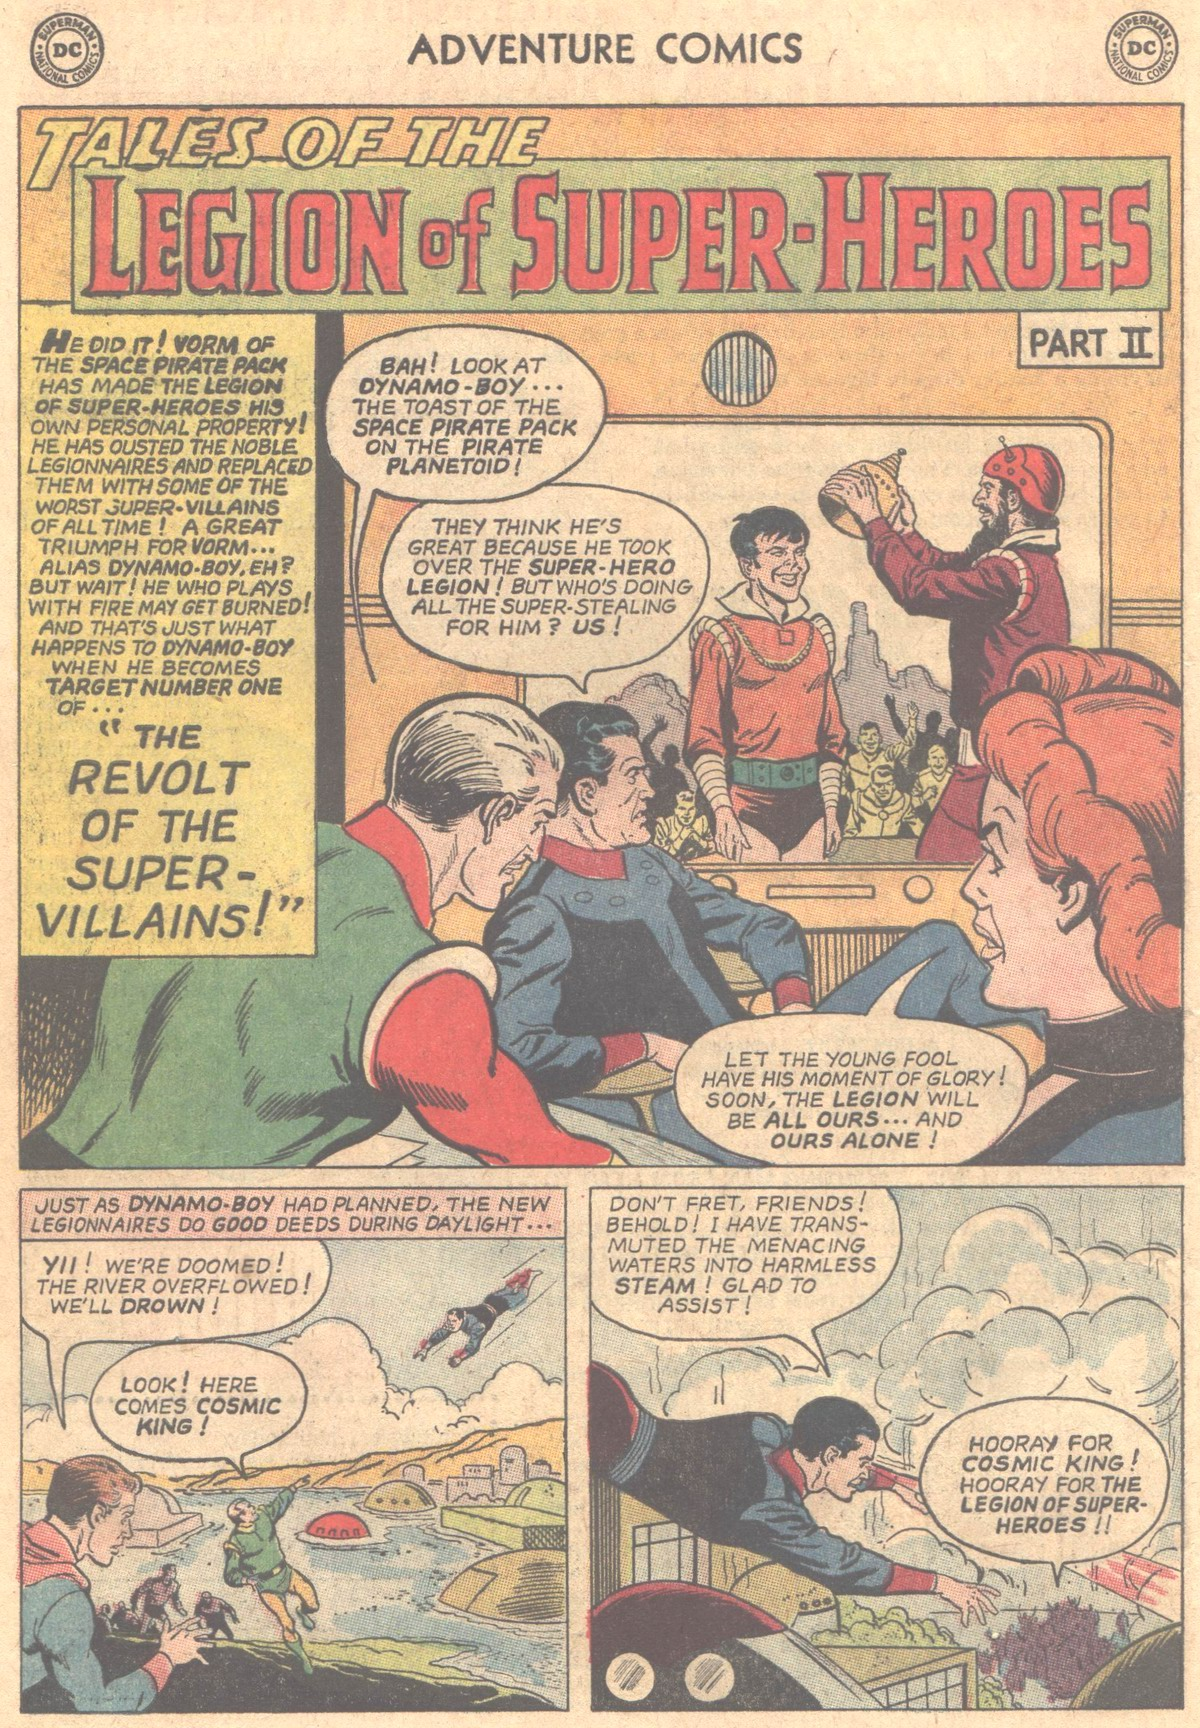 Read online Adventure Comics (1938) comic -  Issue #331 - 11